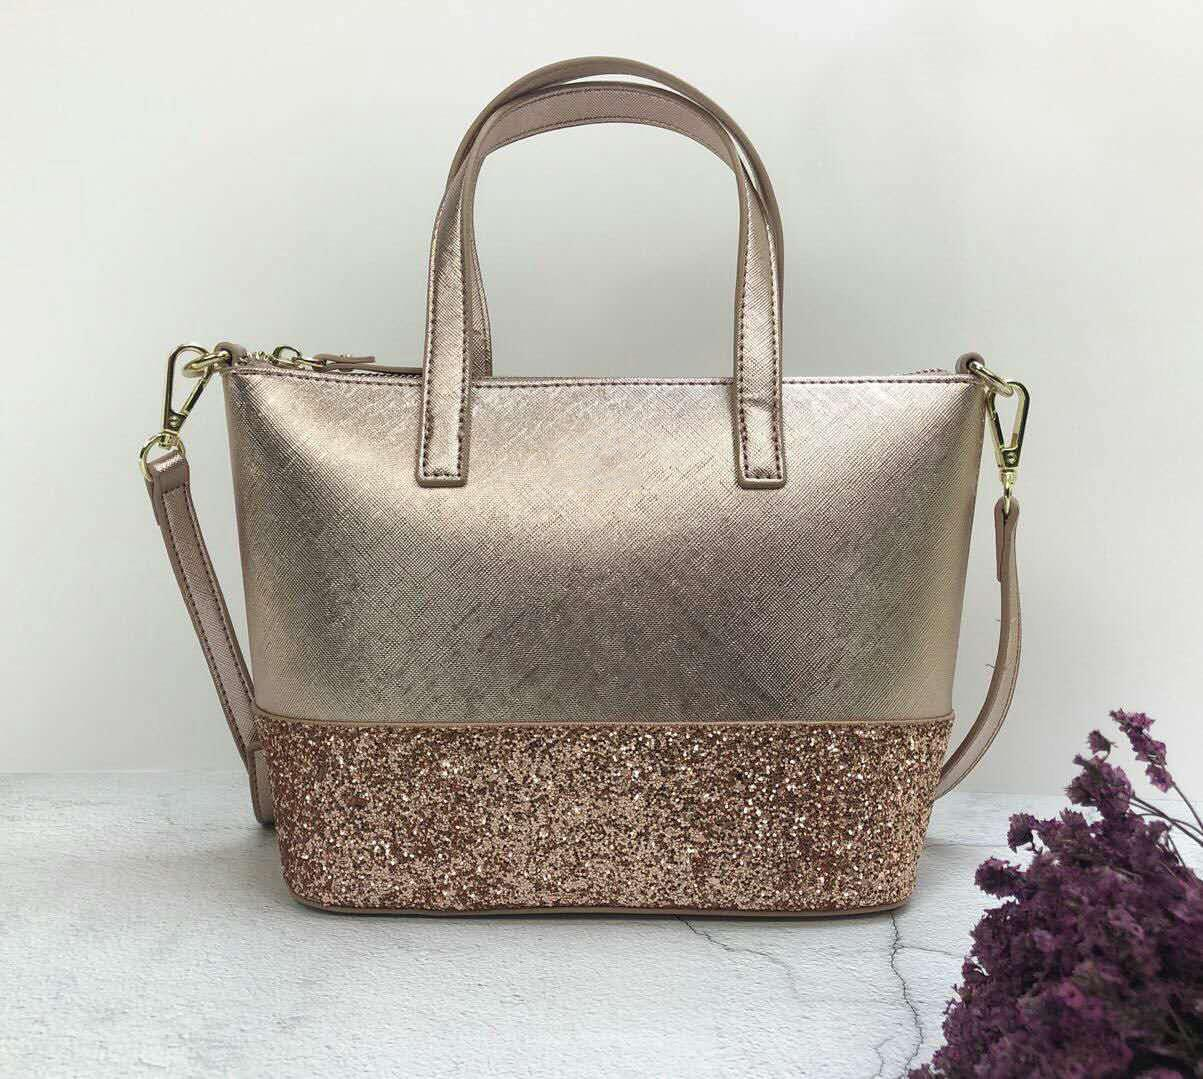 brand designer rose gold purses new glitter Patchwork shining shoulder crossbody shopping bags women handbag totes with Shoulder strap